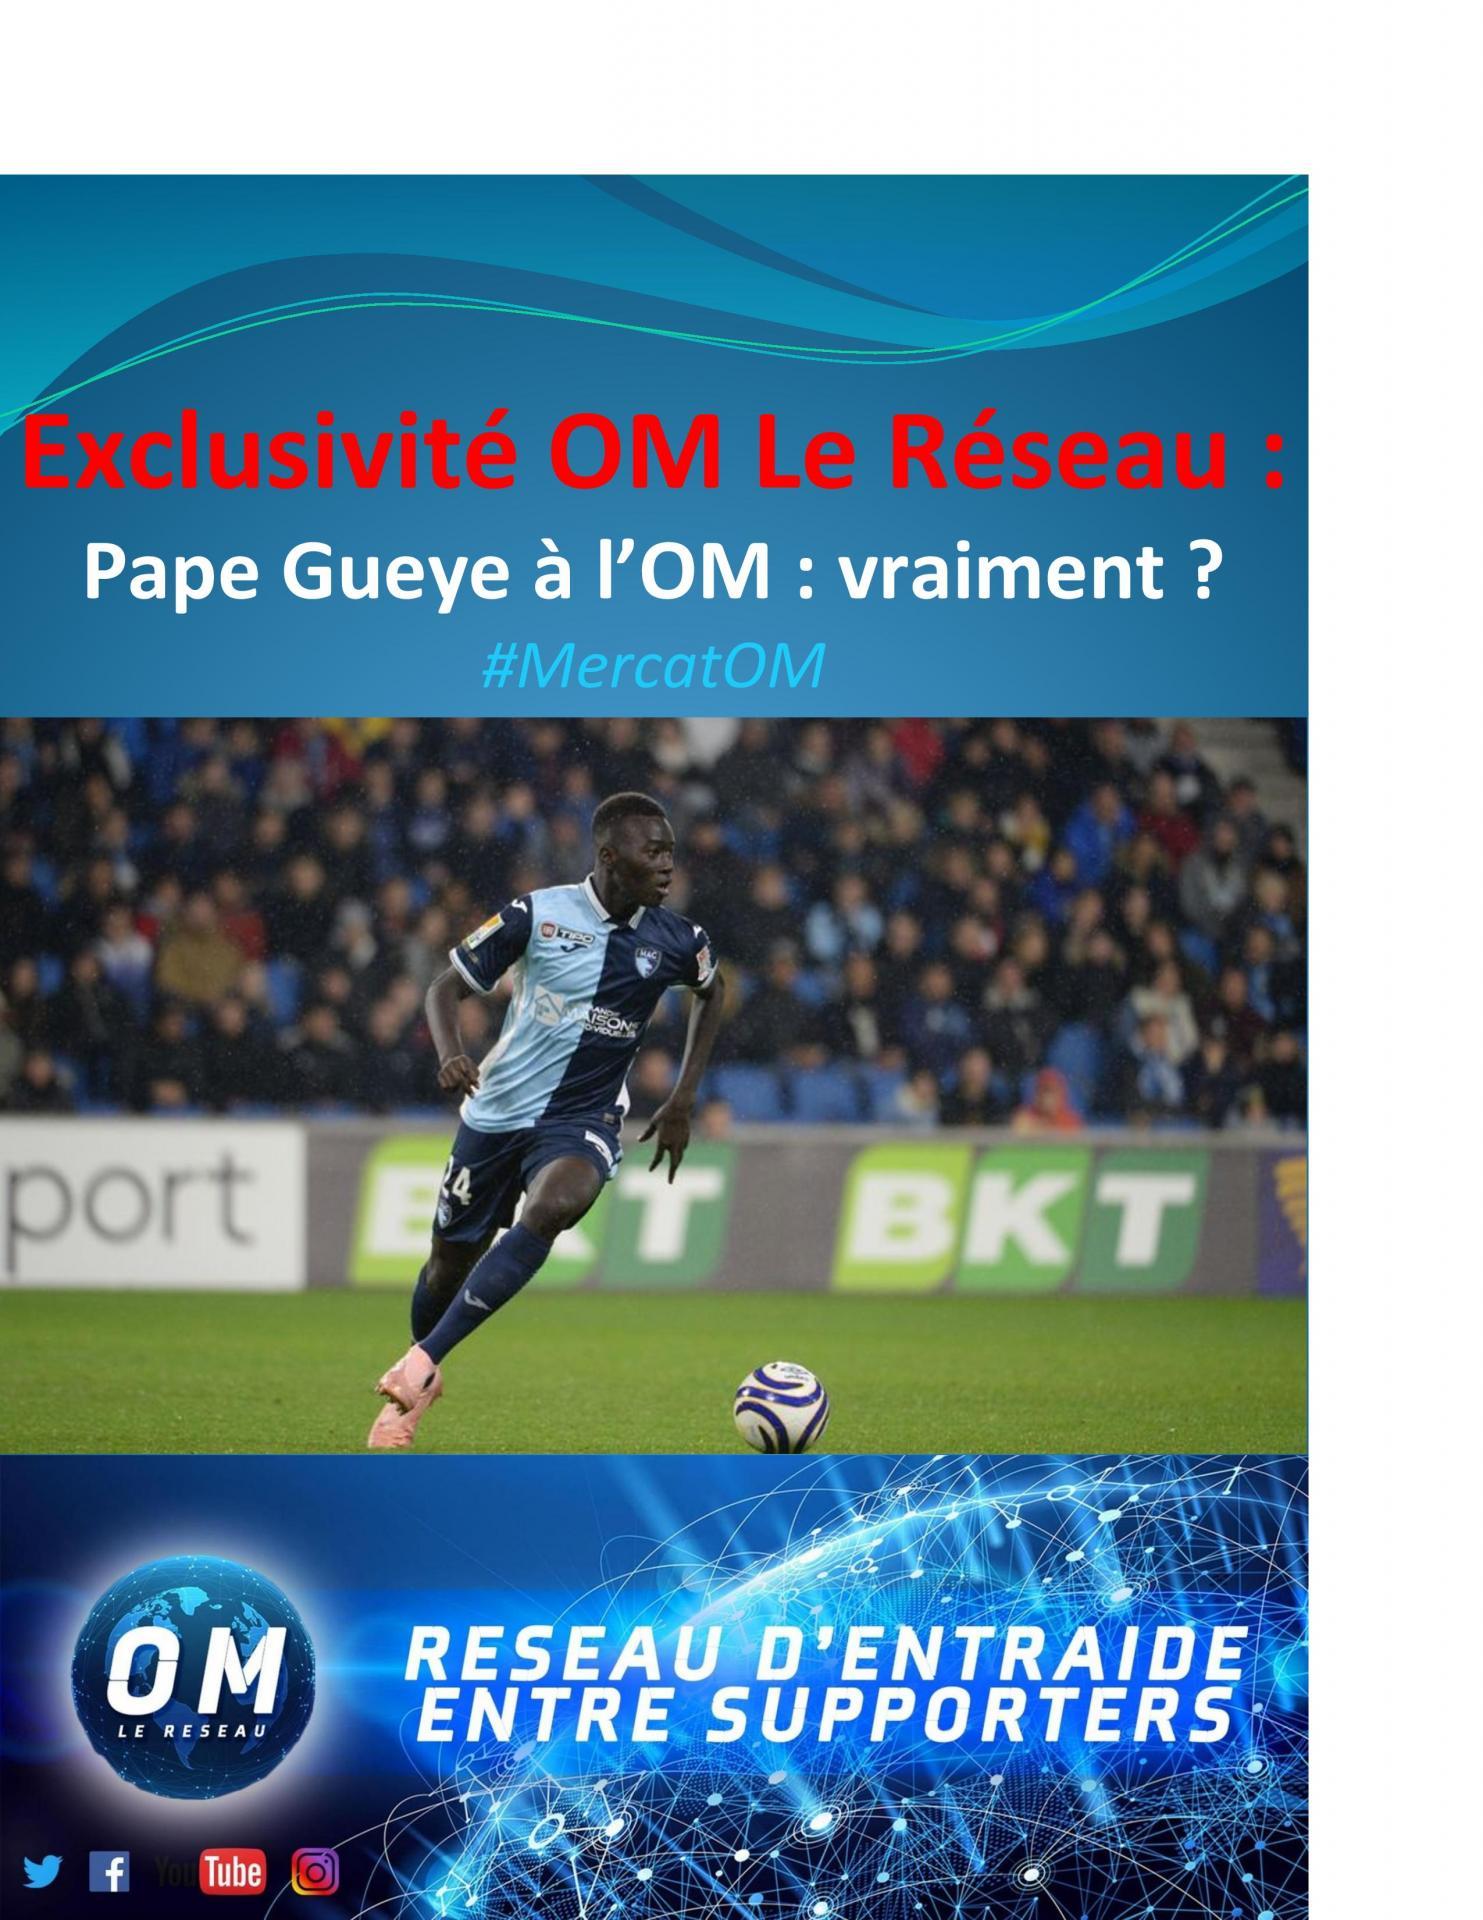 Pape gueye page 001